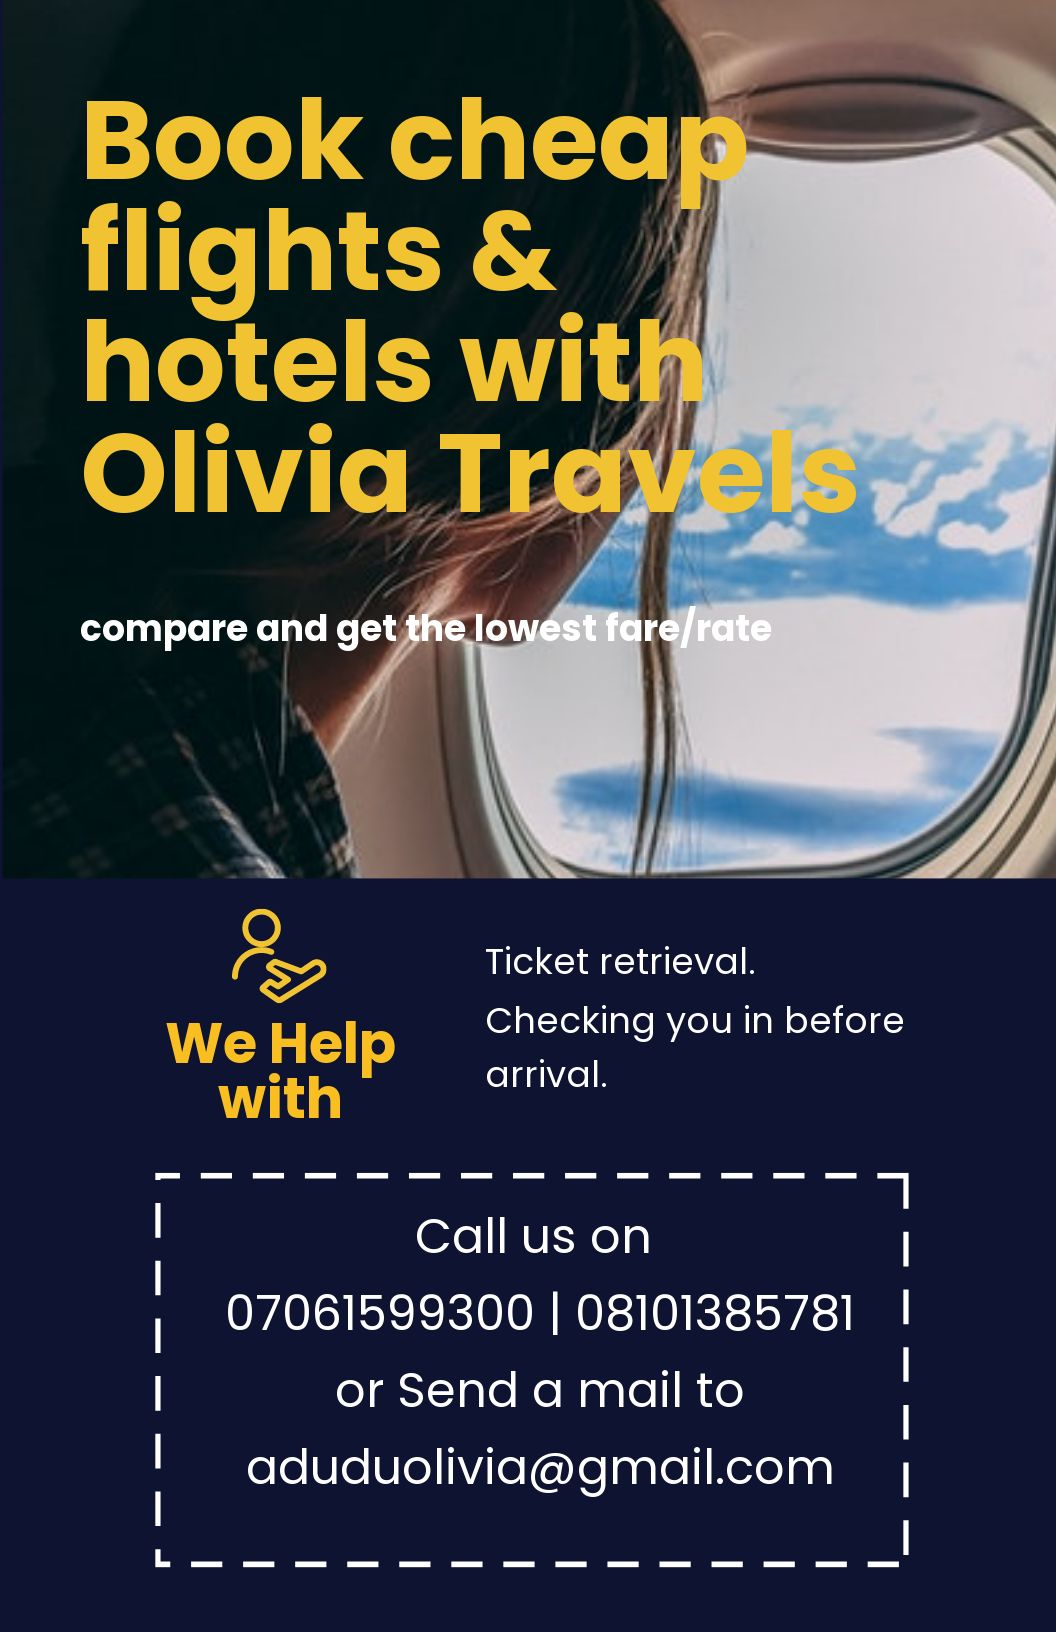 Olivia Travels